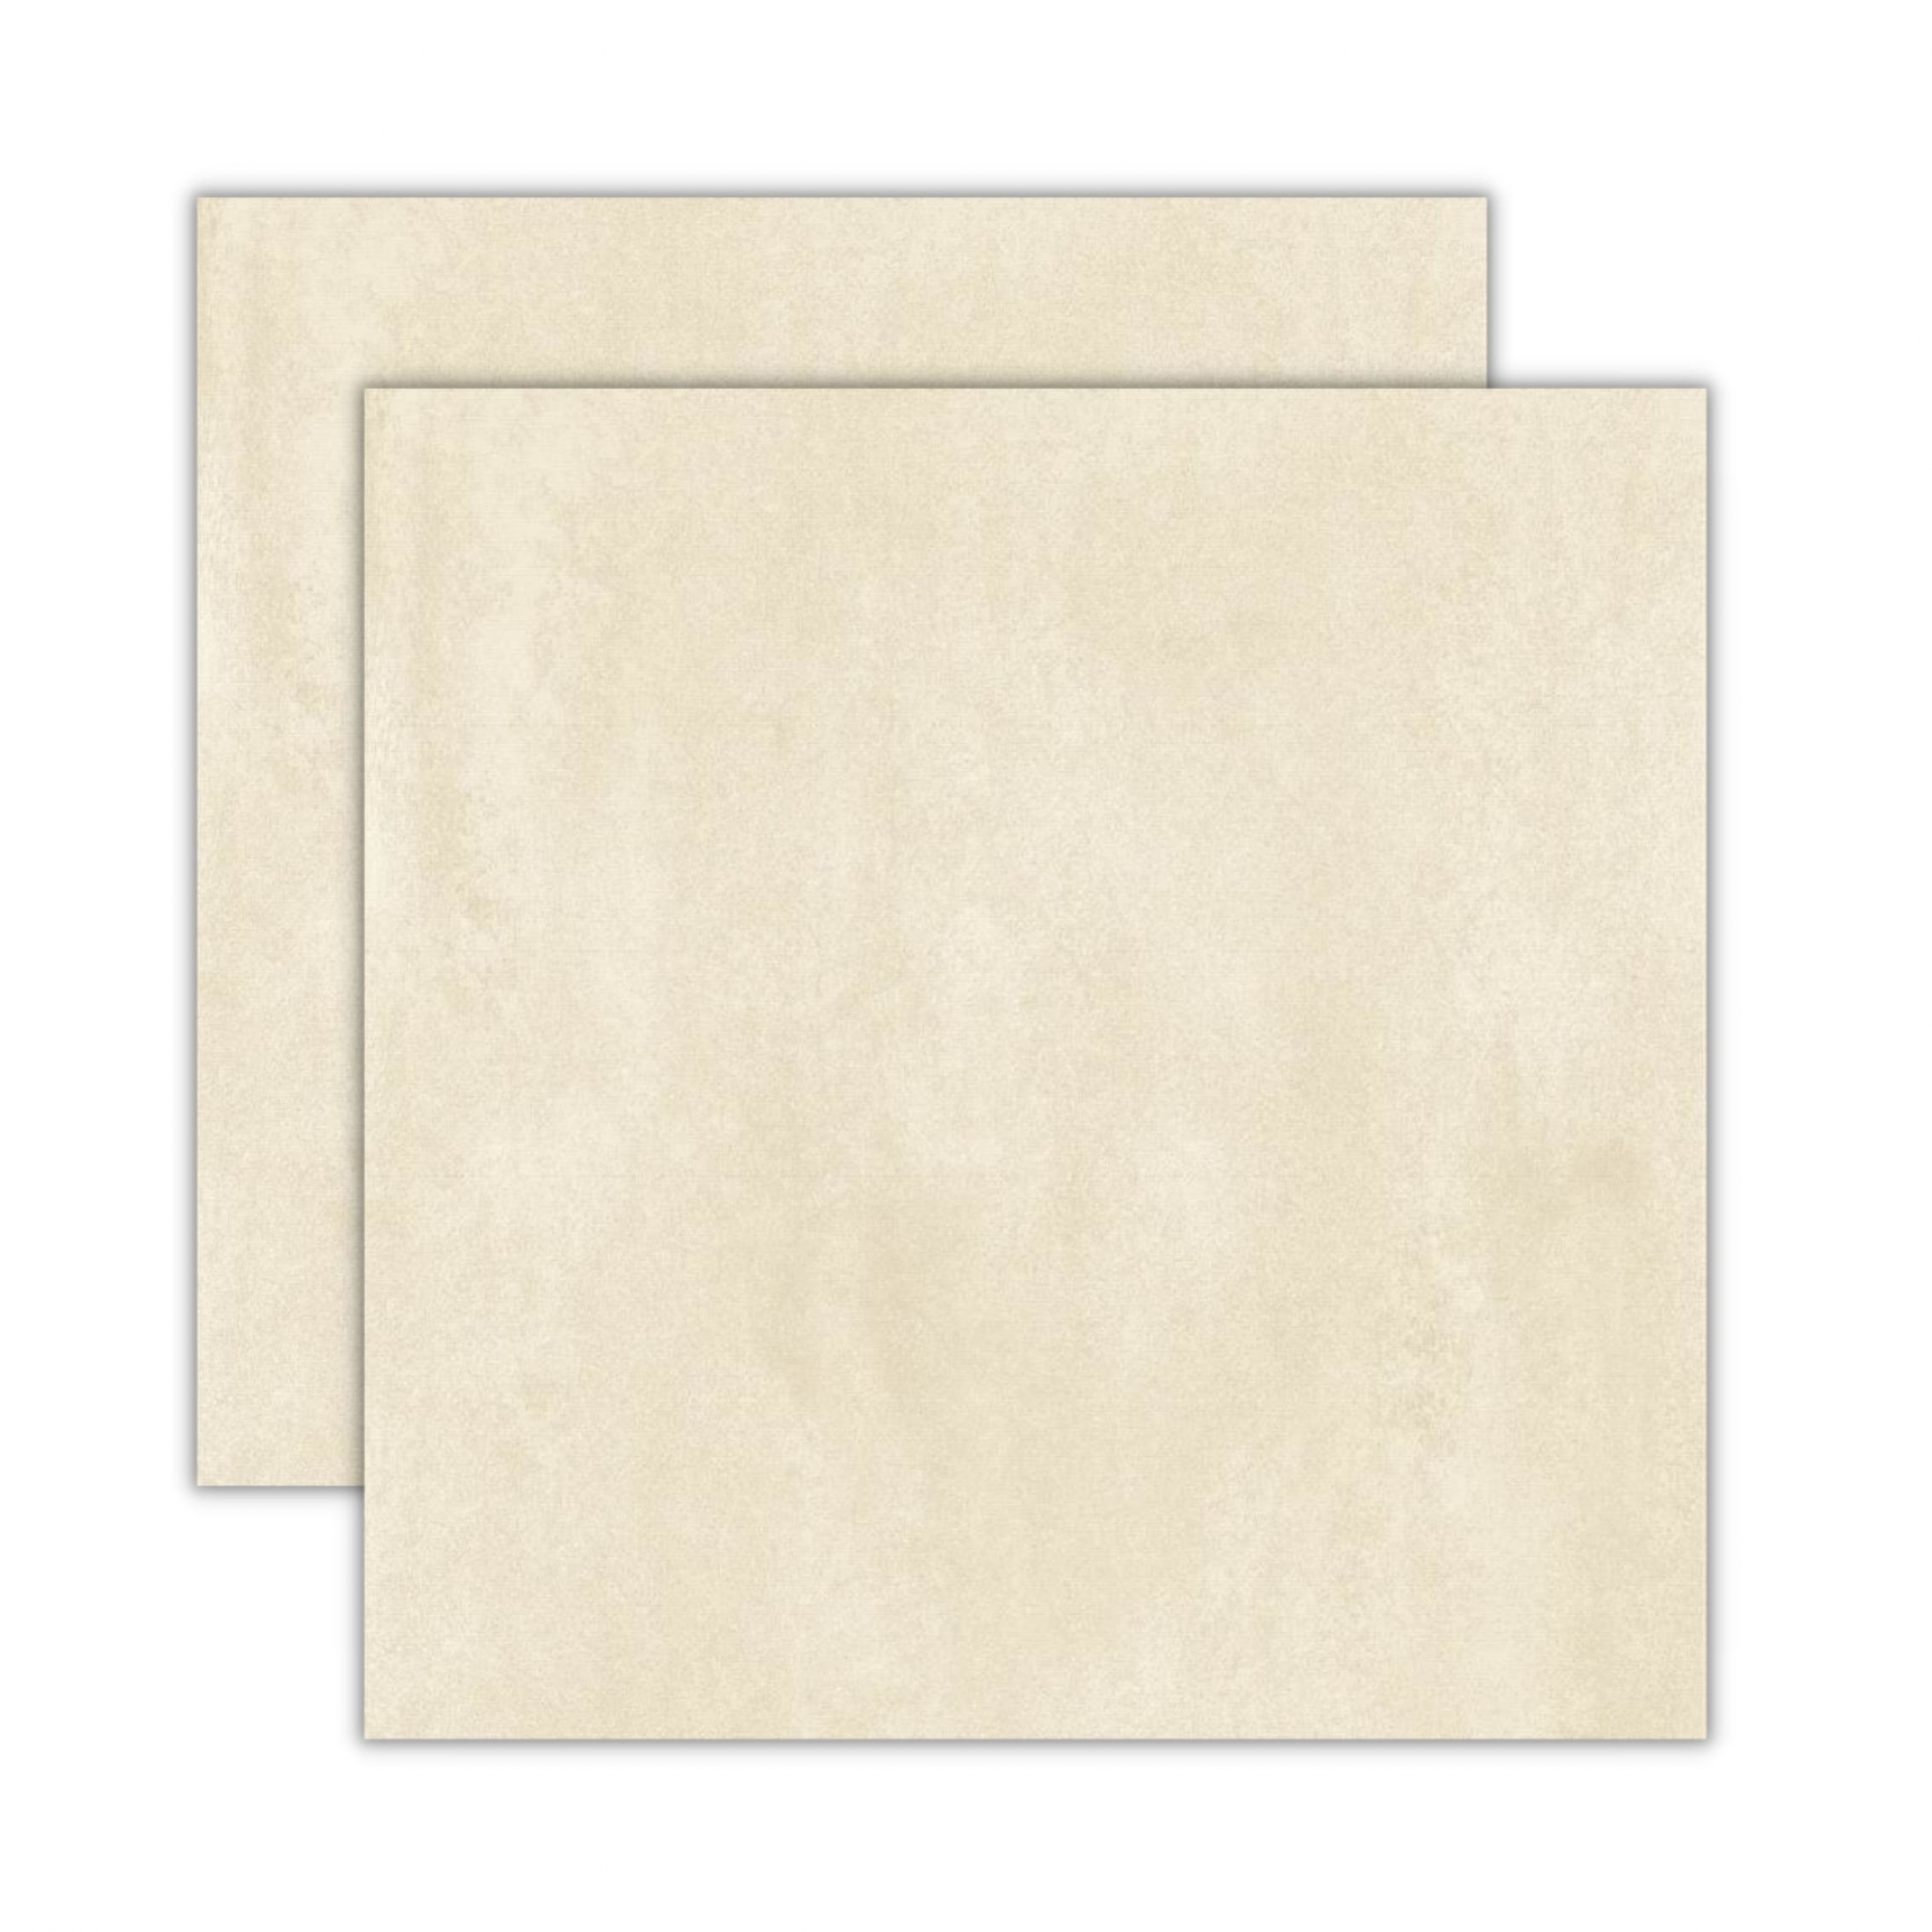 Cemento Avorio 60x60cm<br /><b>R$ 49,80 M² </b><br />Cx  2,15 M²  <b> R$ 107,07</b>